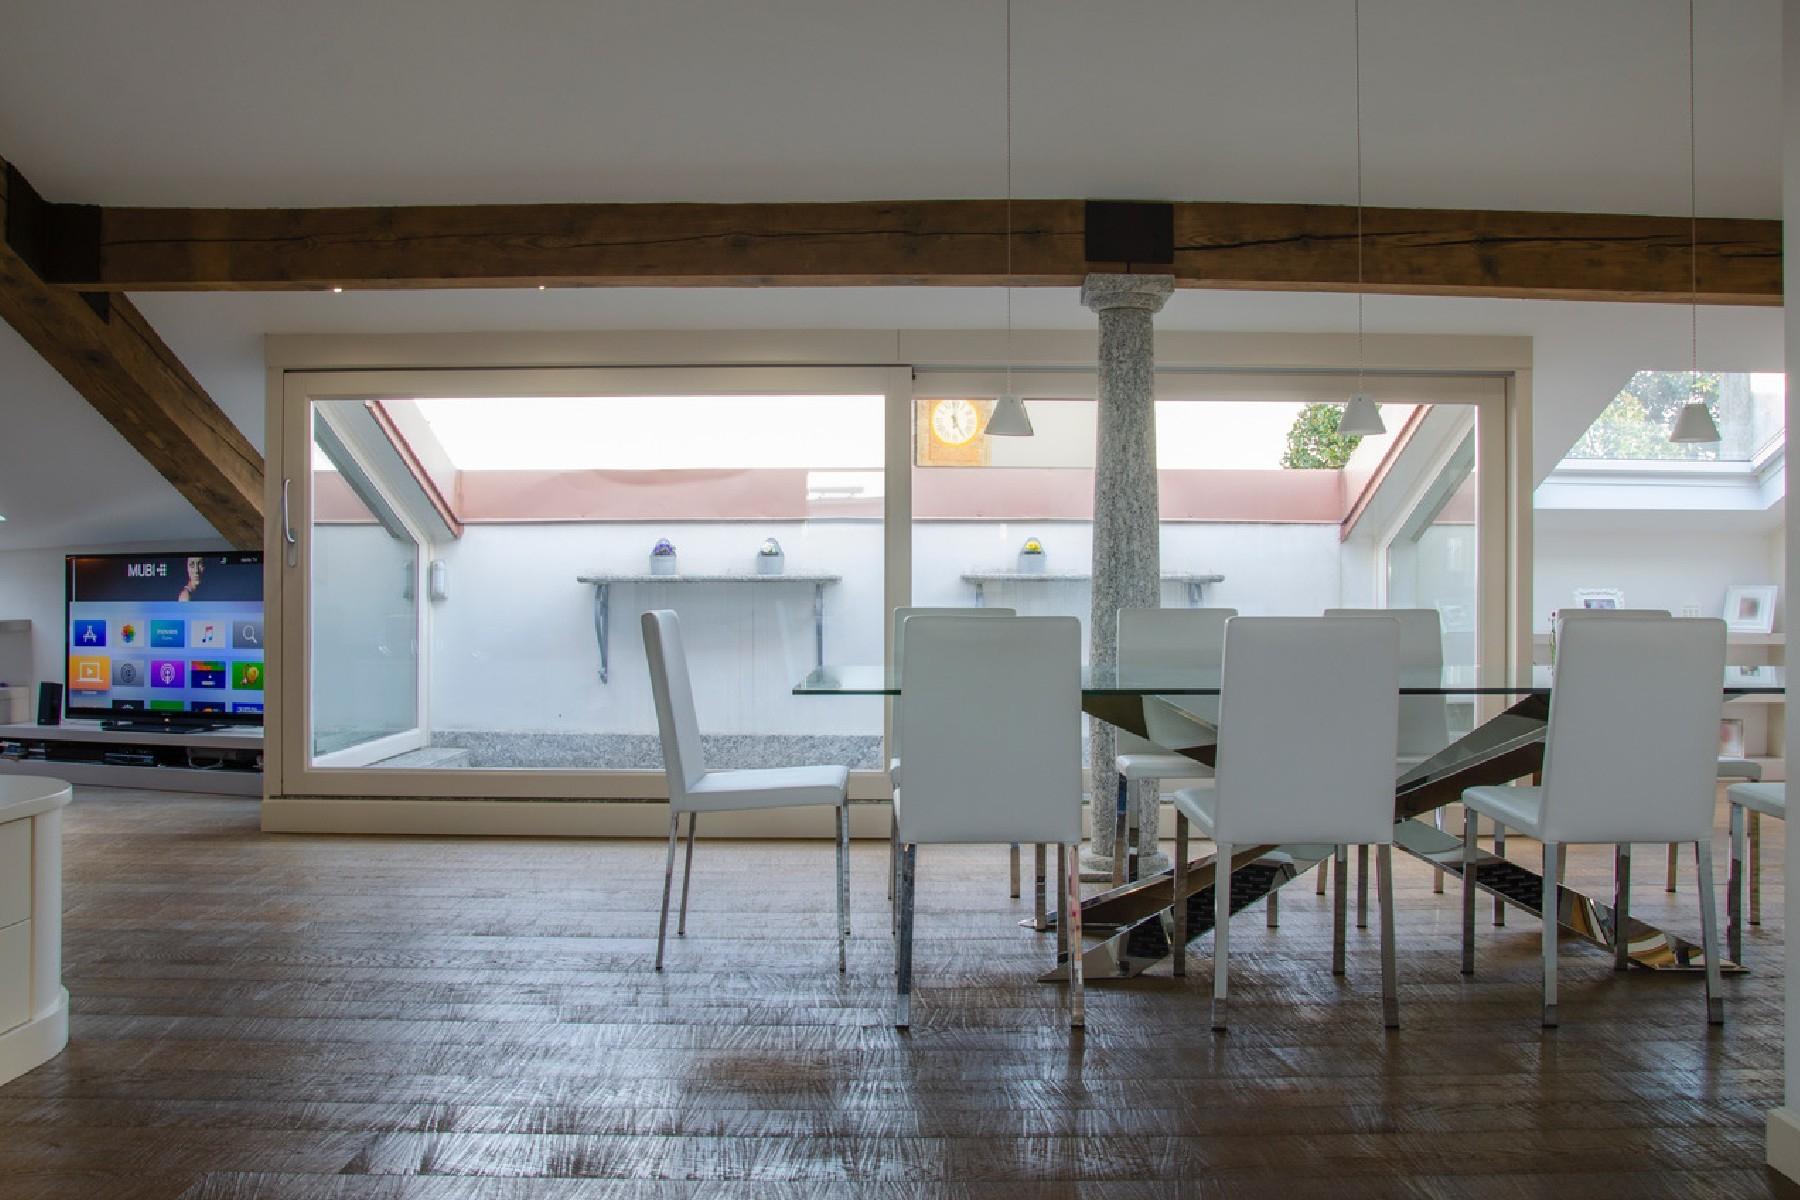 Appartamento in Vendita a Merate: 4 locali, 225 mq - Foto 17